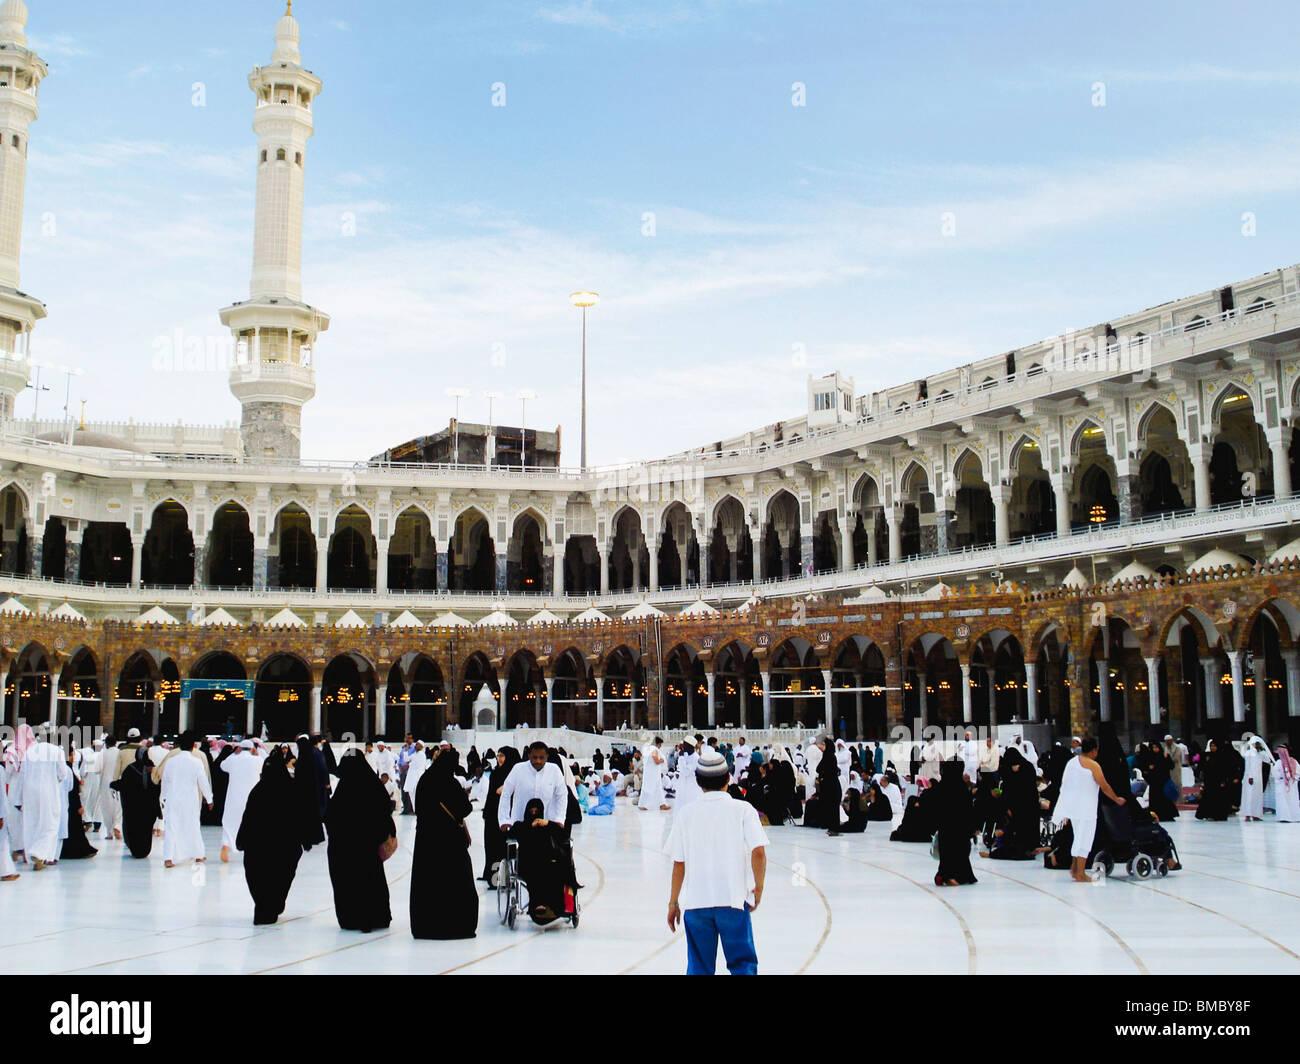 Al-Haram Mosque, Saudi Arabia: photos and description 49